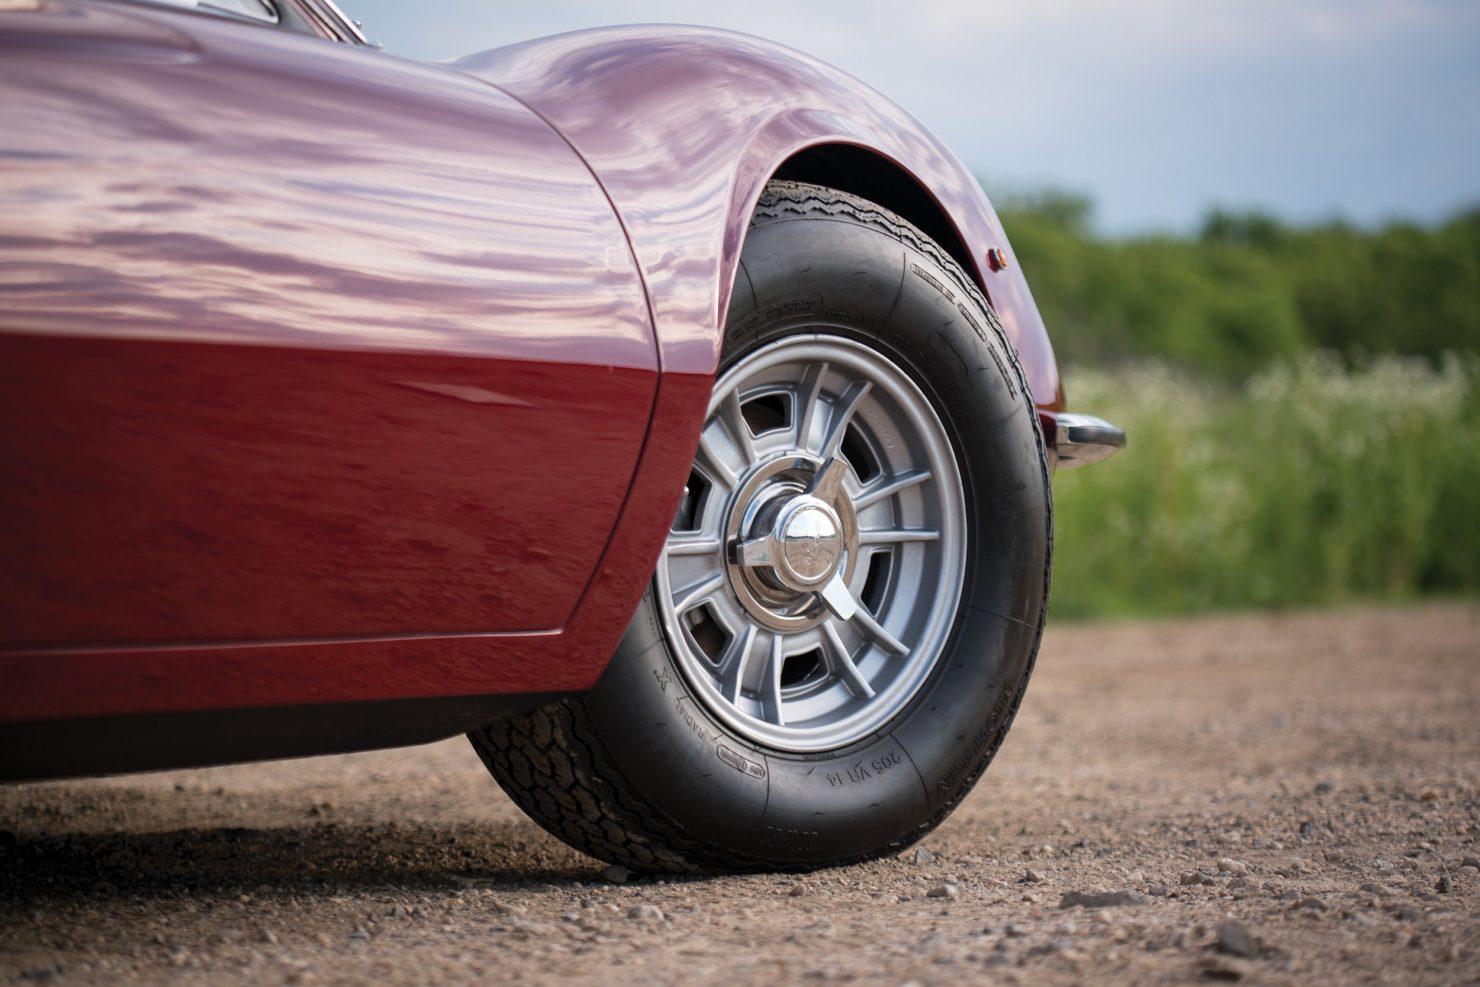 ferrari dino 246 18 1480x987 - 1969 Ferrari Dino 246 GT